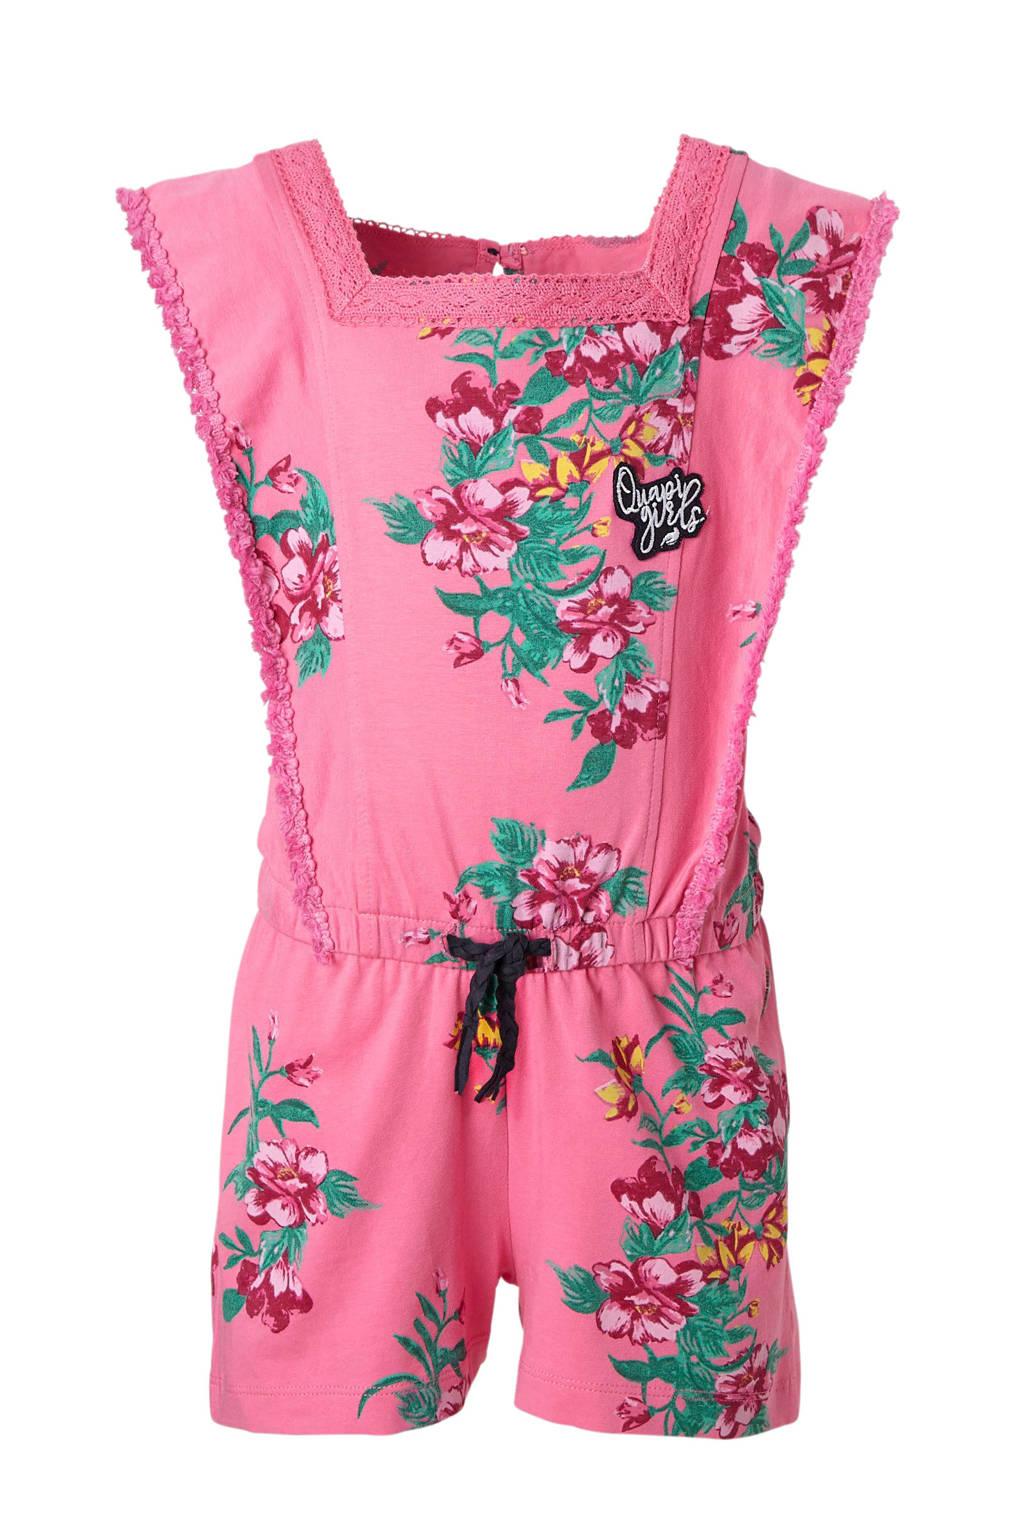 Quapi gebloemde jumpsuit Shenna roze, Roze/groen